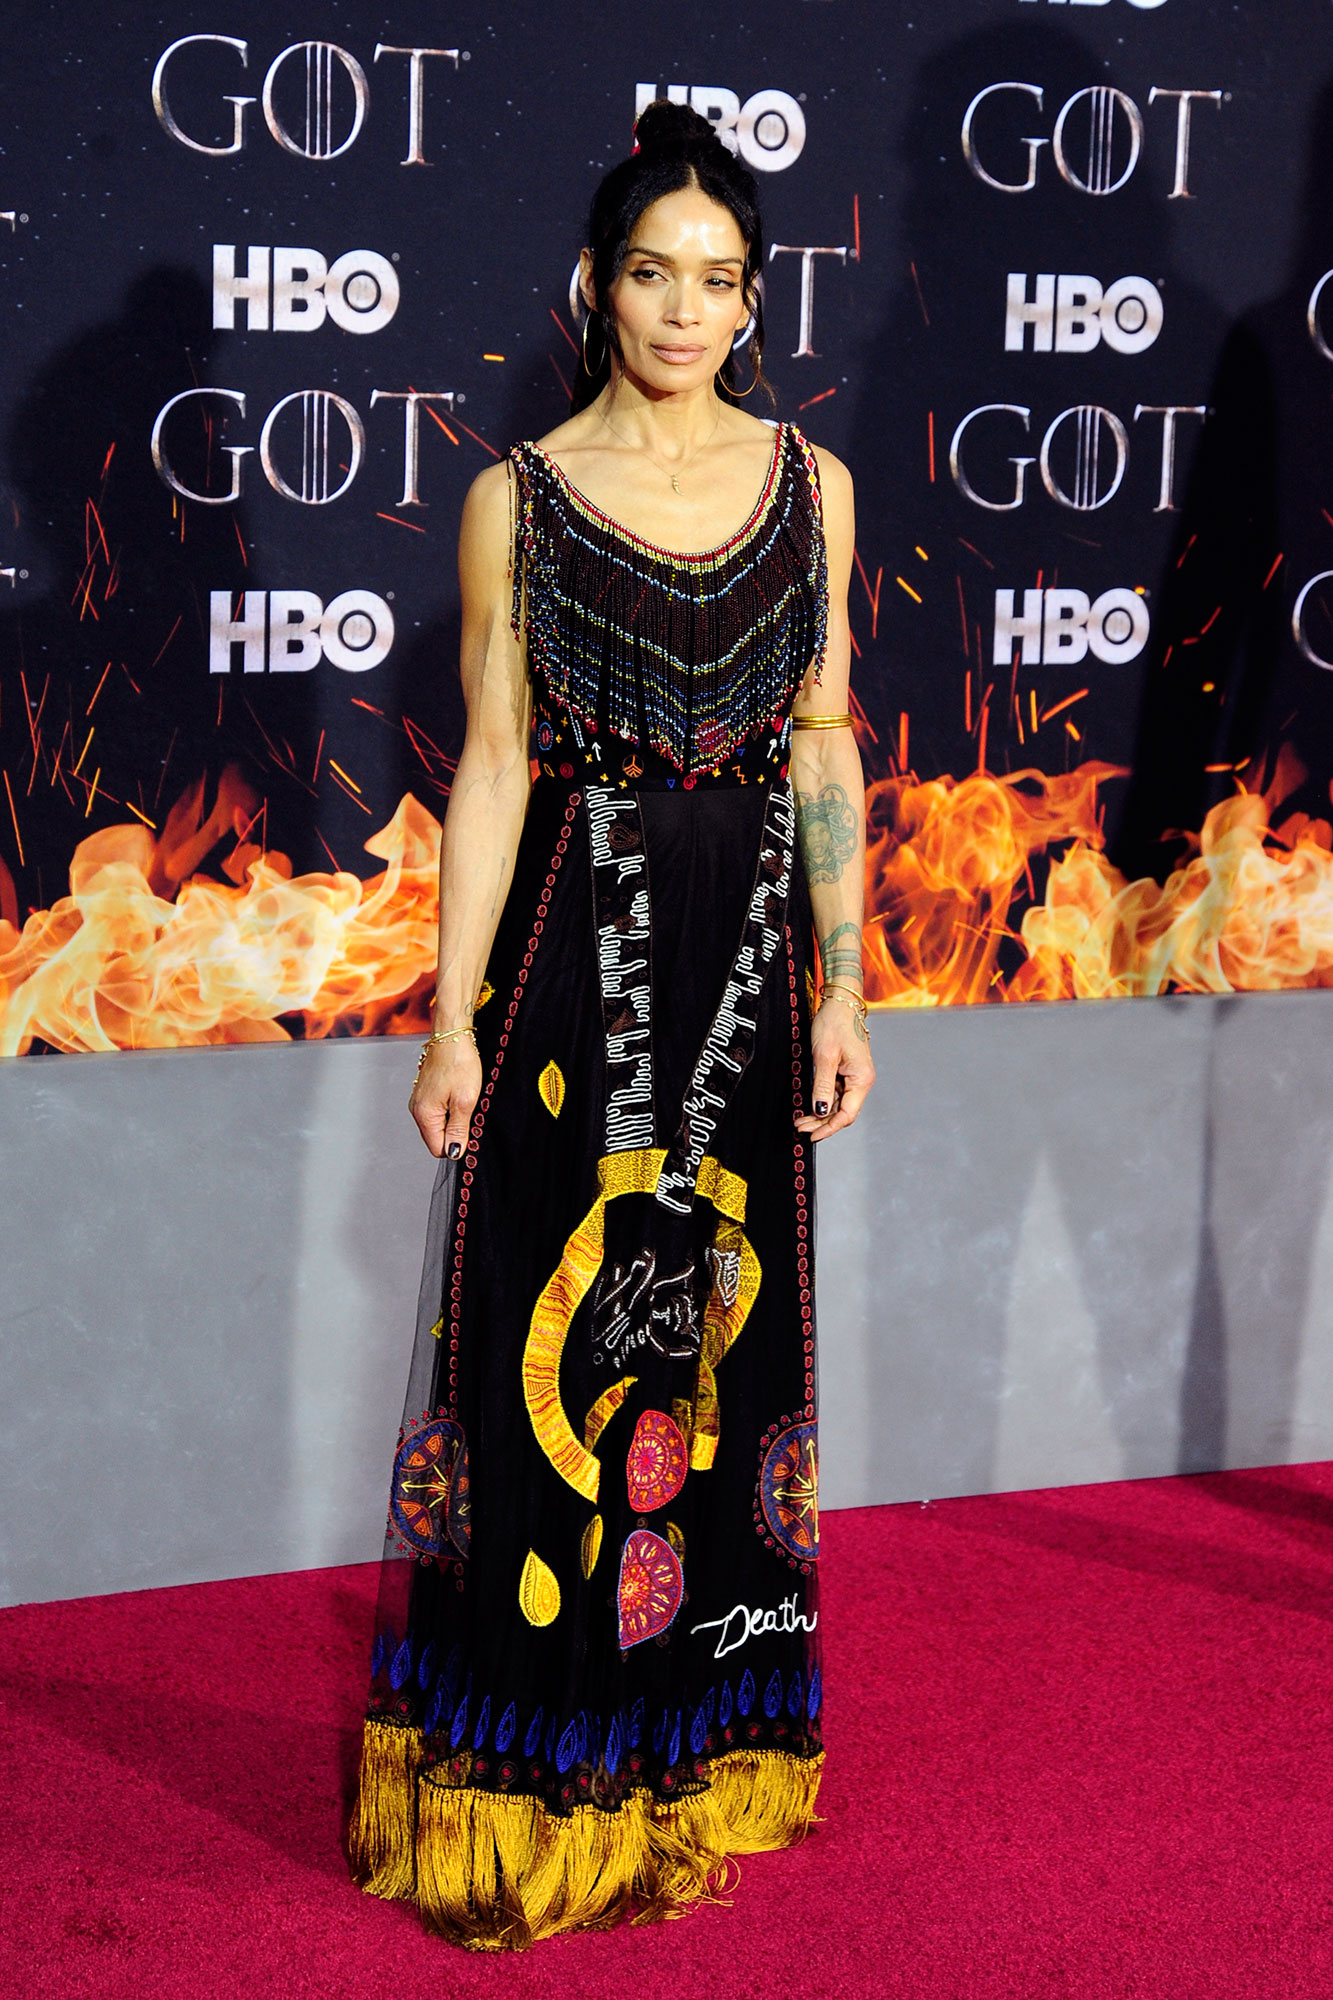 Lisa Bonet Game Of Thrones - Wearing a skeleton- and snake-adorned fringe Dior gown.